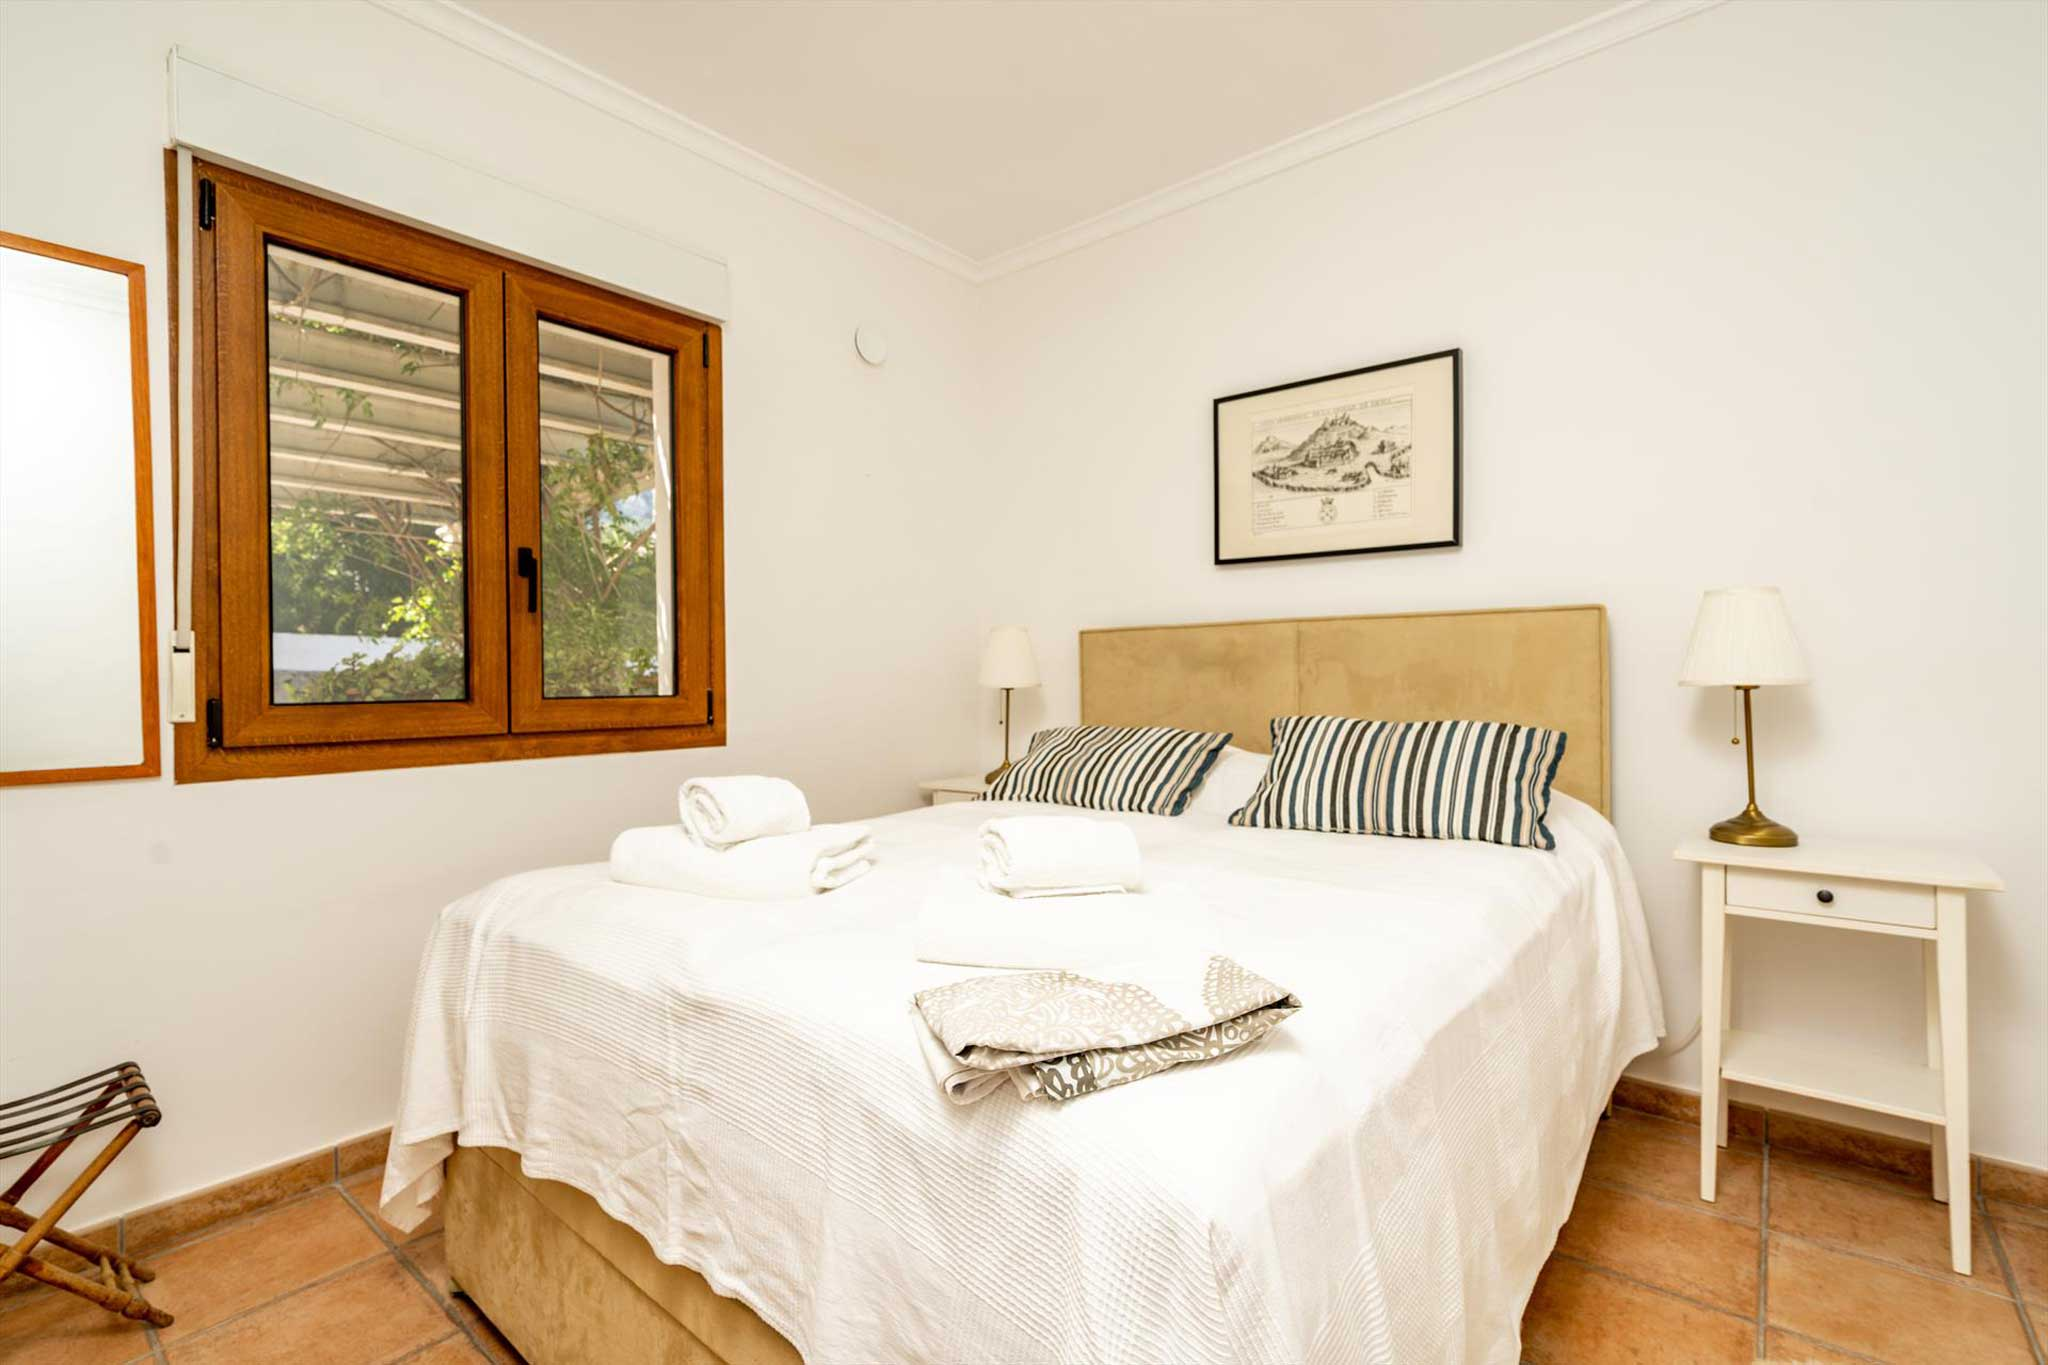 Alquiler de casas vacacionales Denia – Quality Rent a Villa